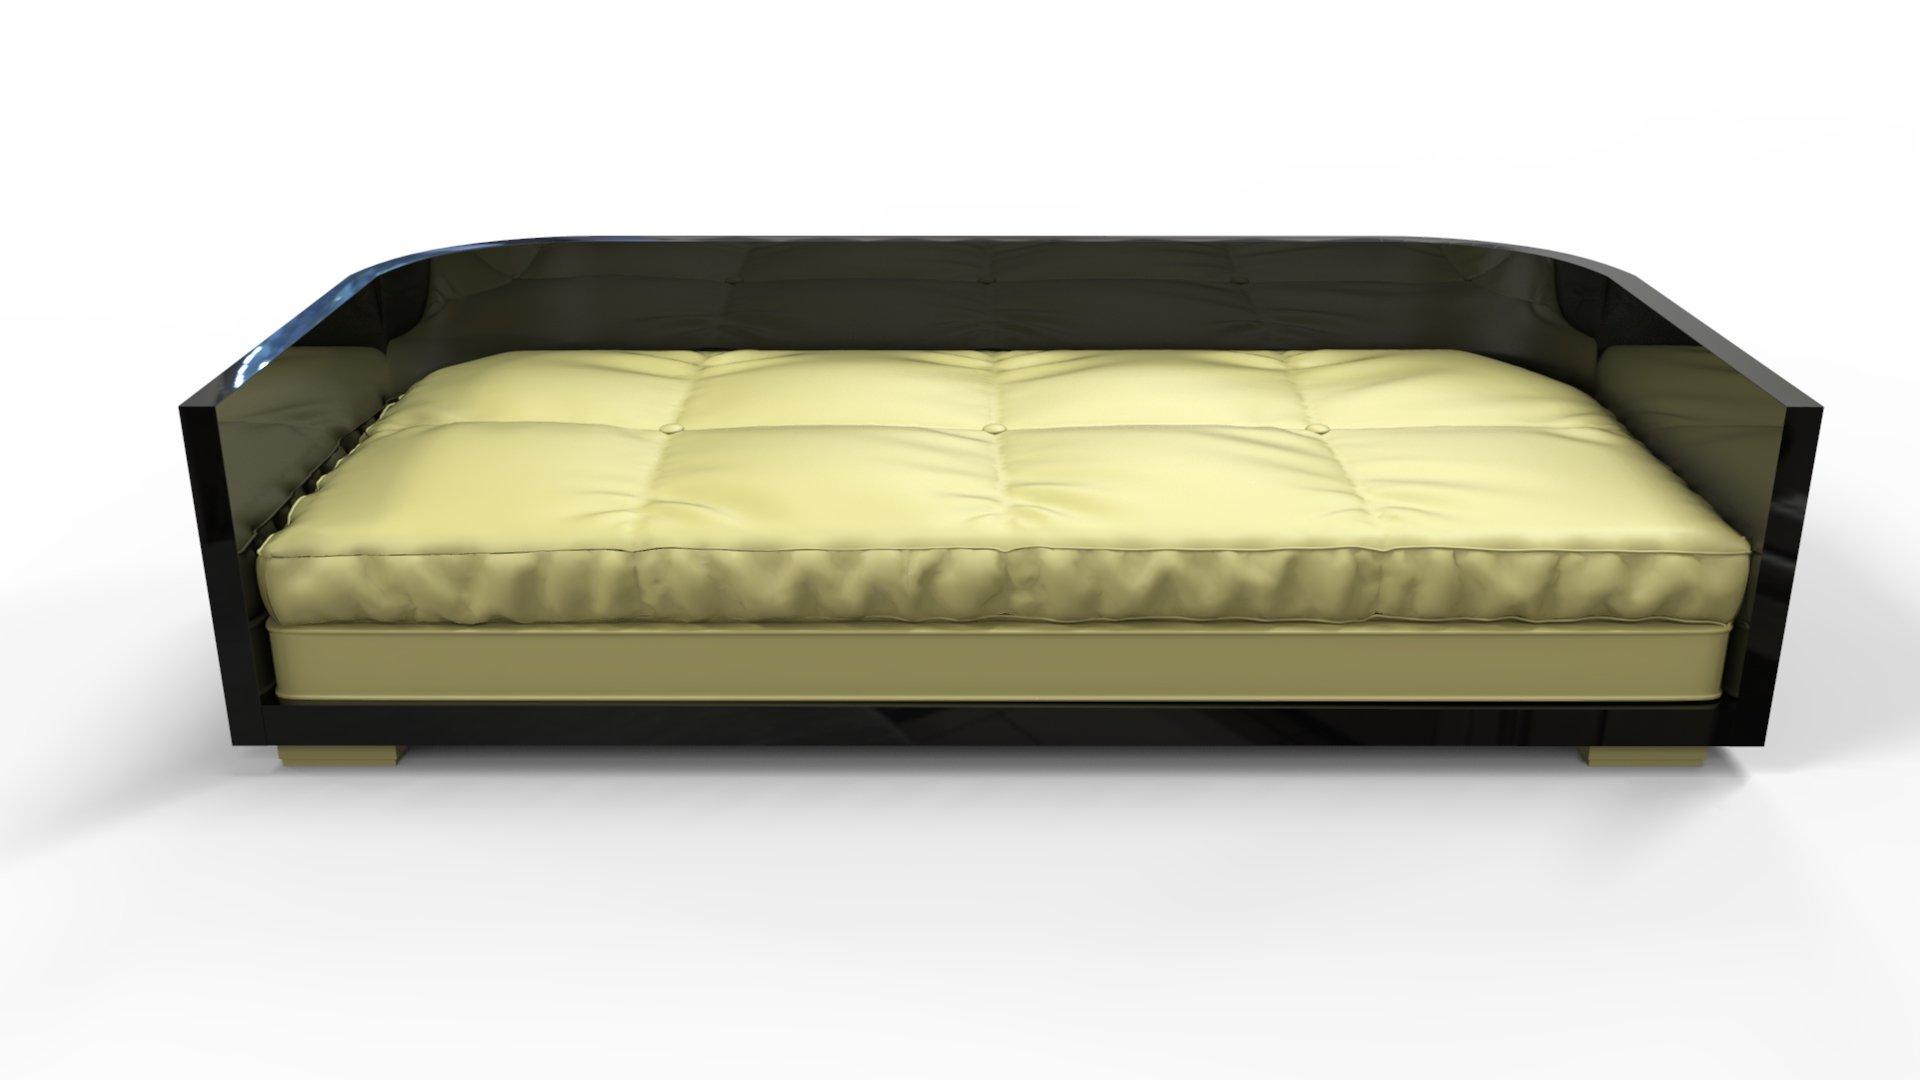 Black Art Deco Sofa, 1920s 4. $8,265.00. Price Per Piece